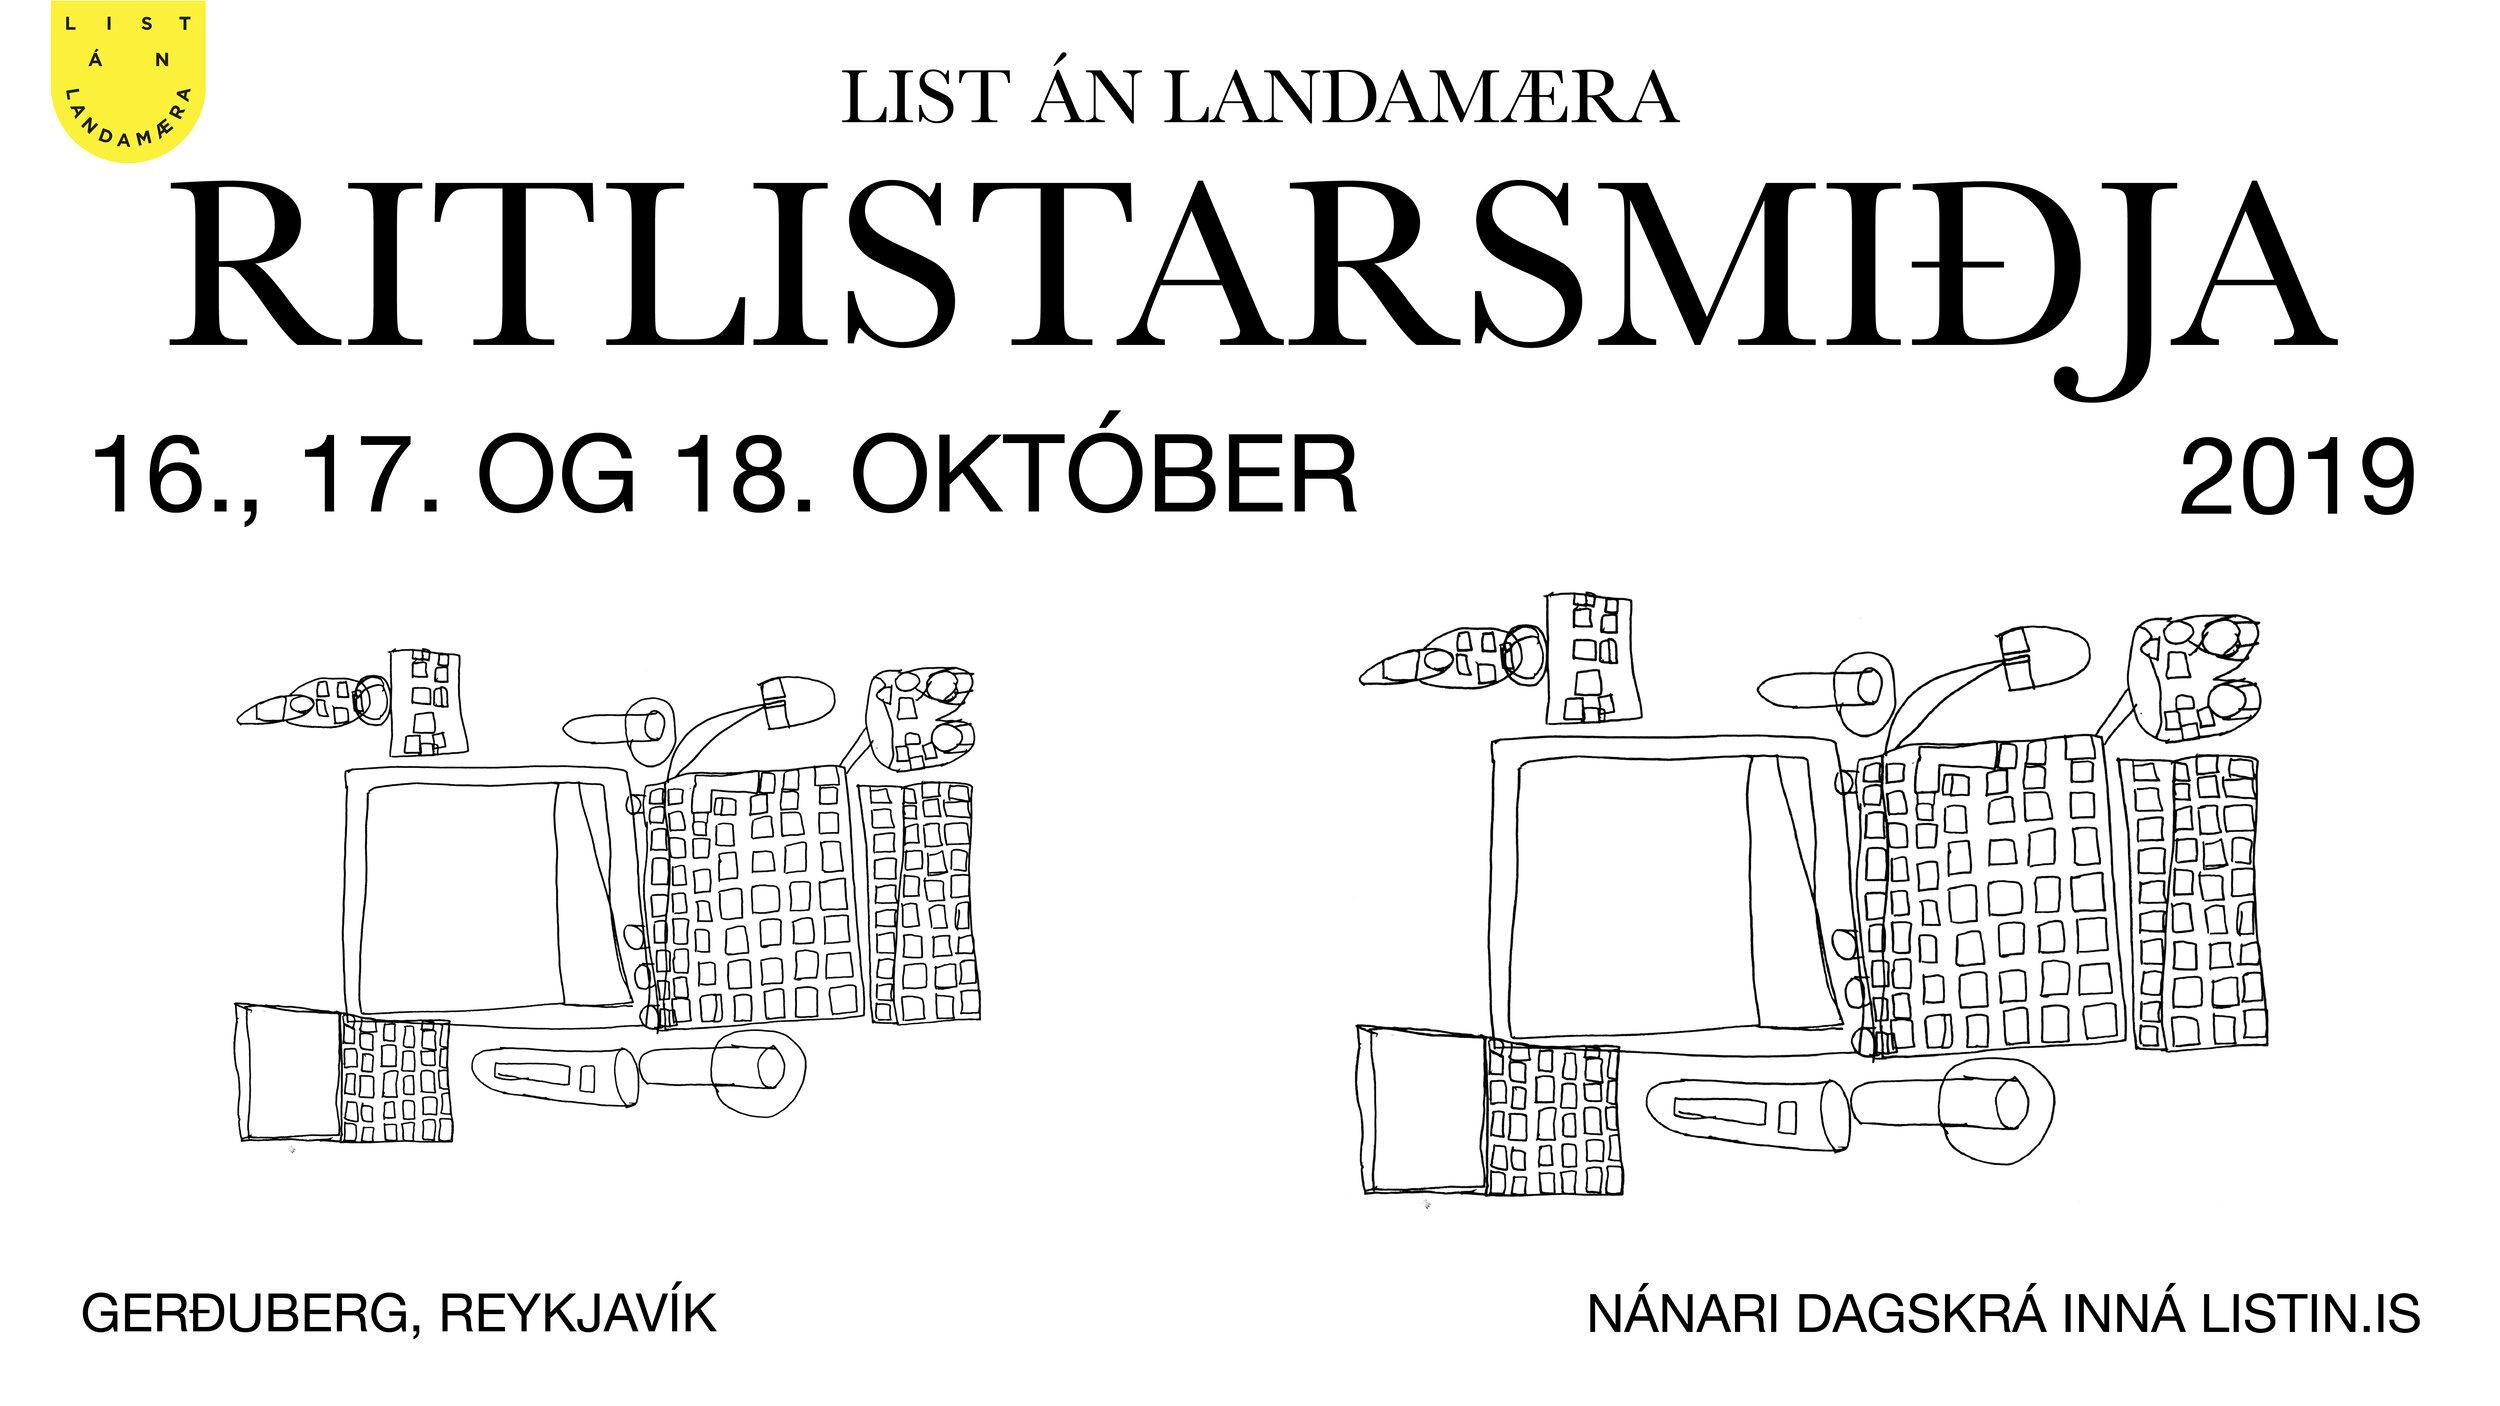 ritlistasmiðja banner.jpg